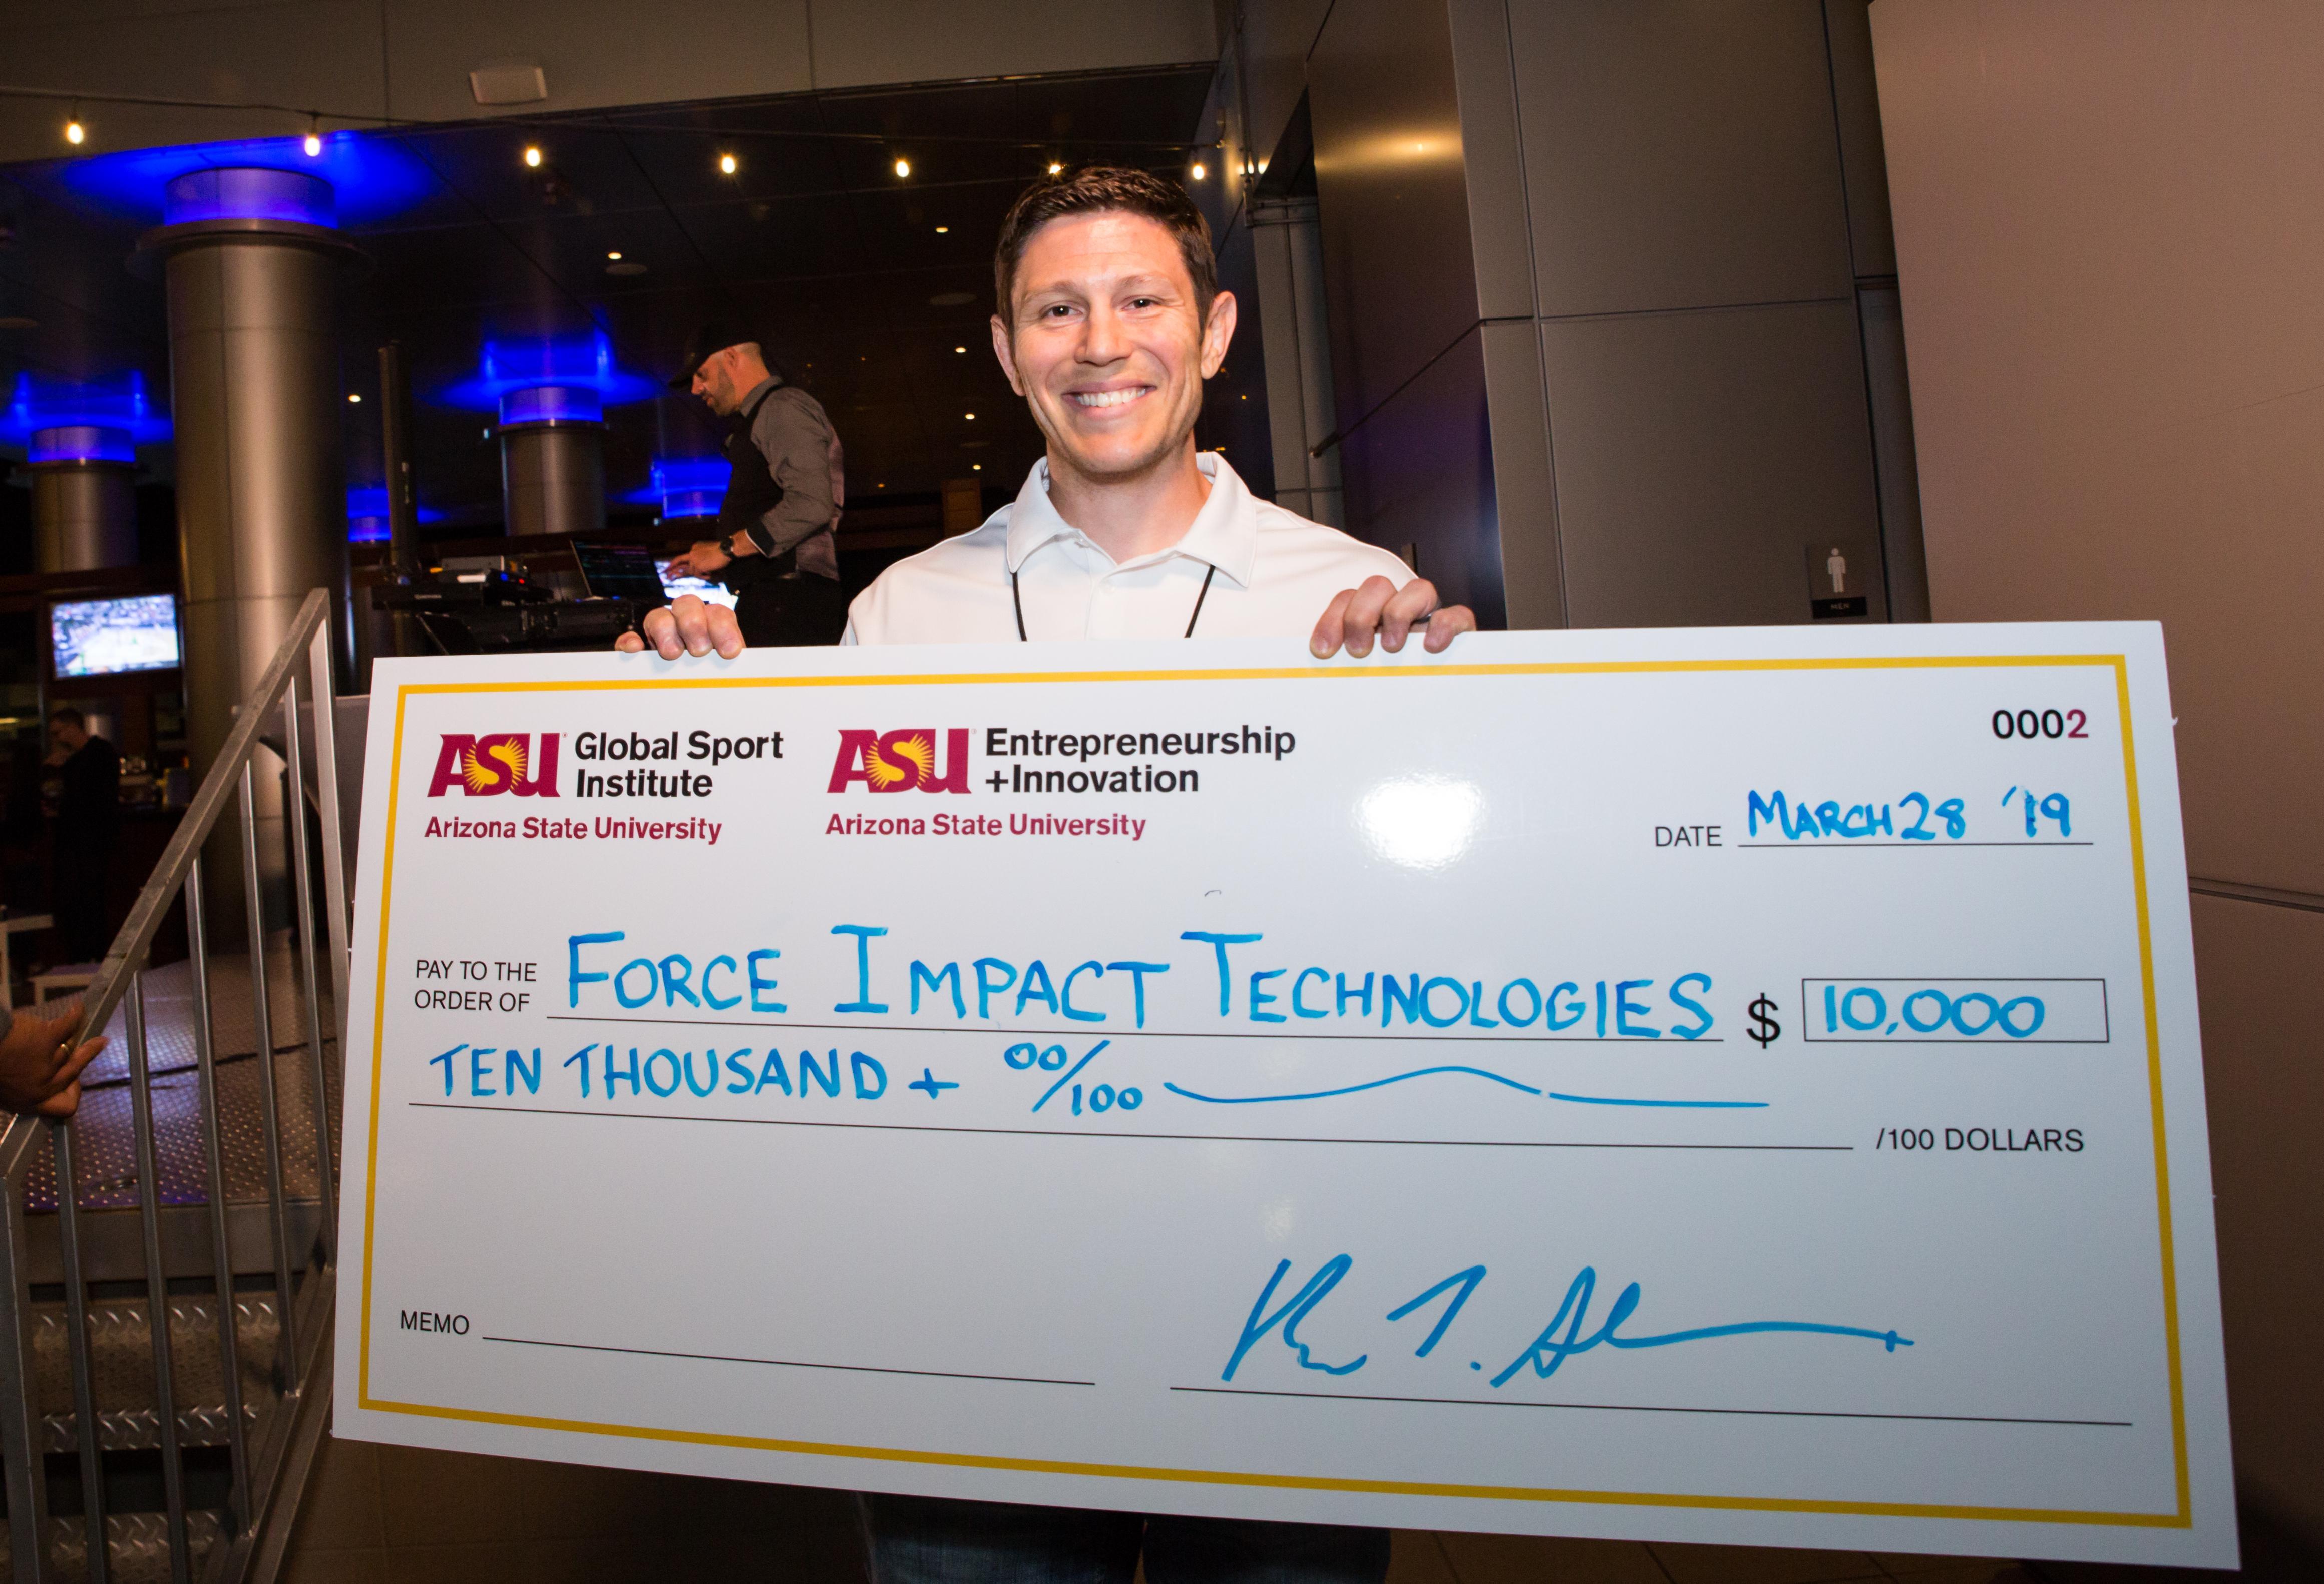 Venture Devil Program: Recipient receiving a check for $10,000.